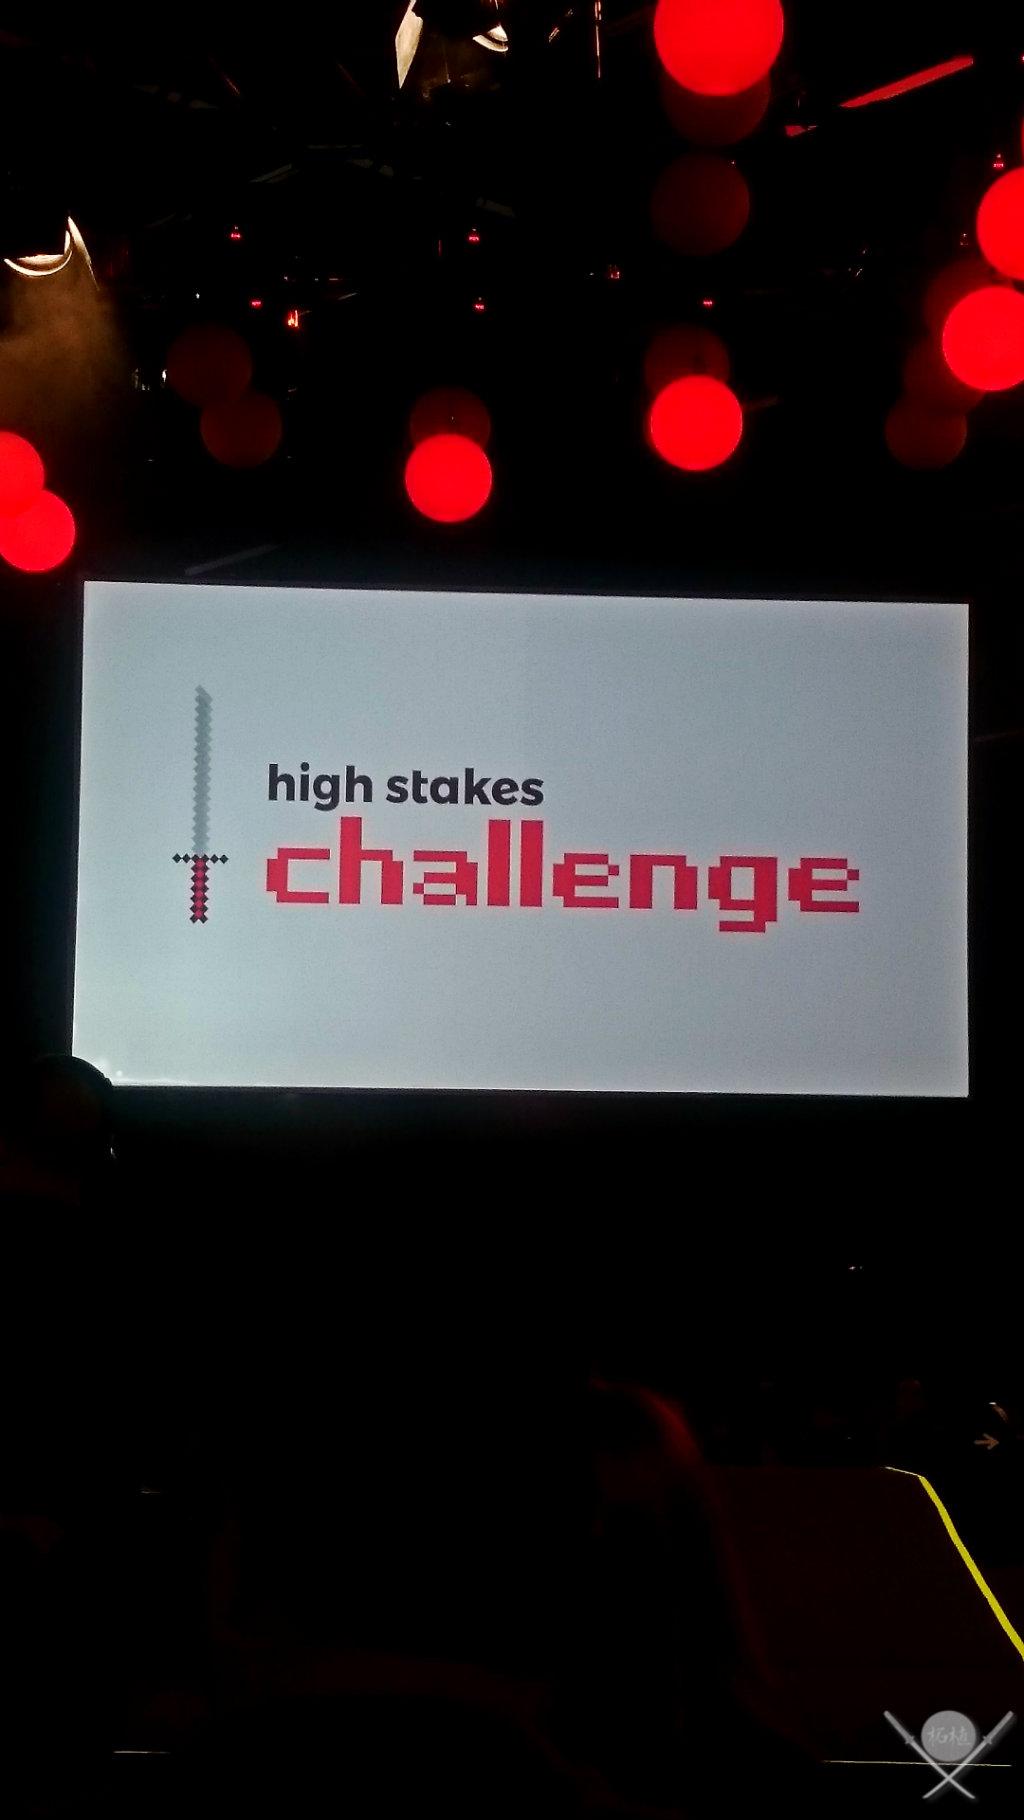 High Stakes Experience - Hs Challenge - Lifestyle - Sacada Samurai - Vida de Tsuge - VDT